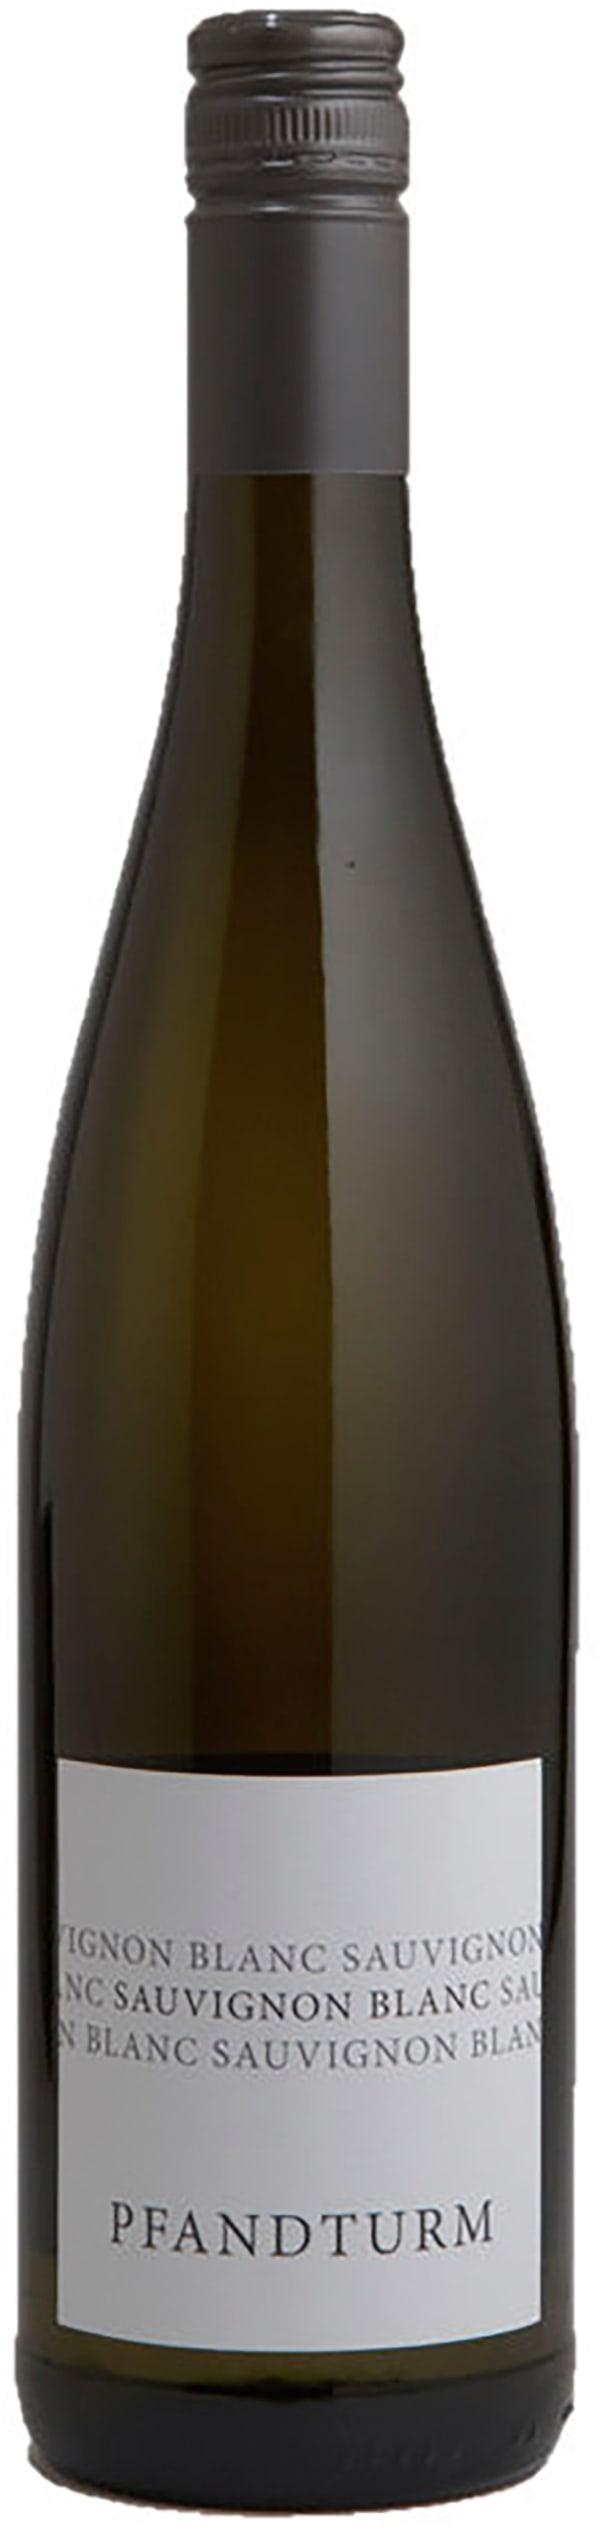 Pfandtrum Sauvignon Blanc 2017